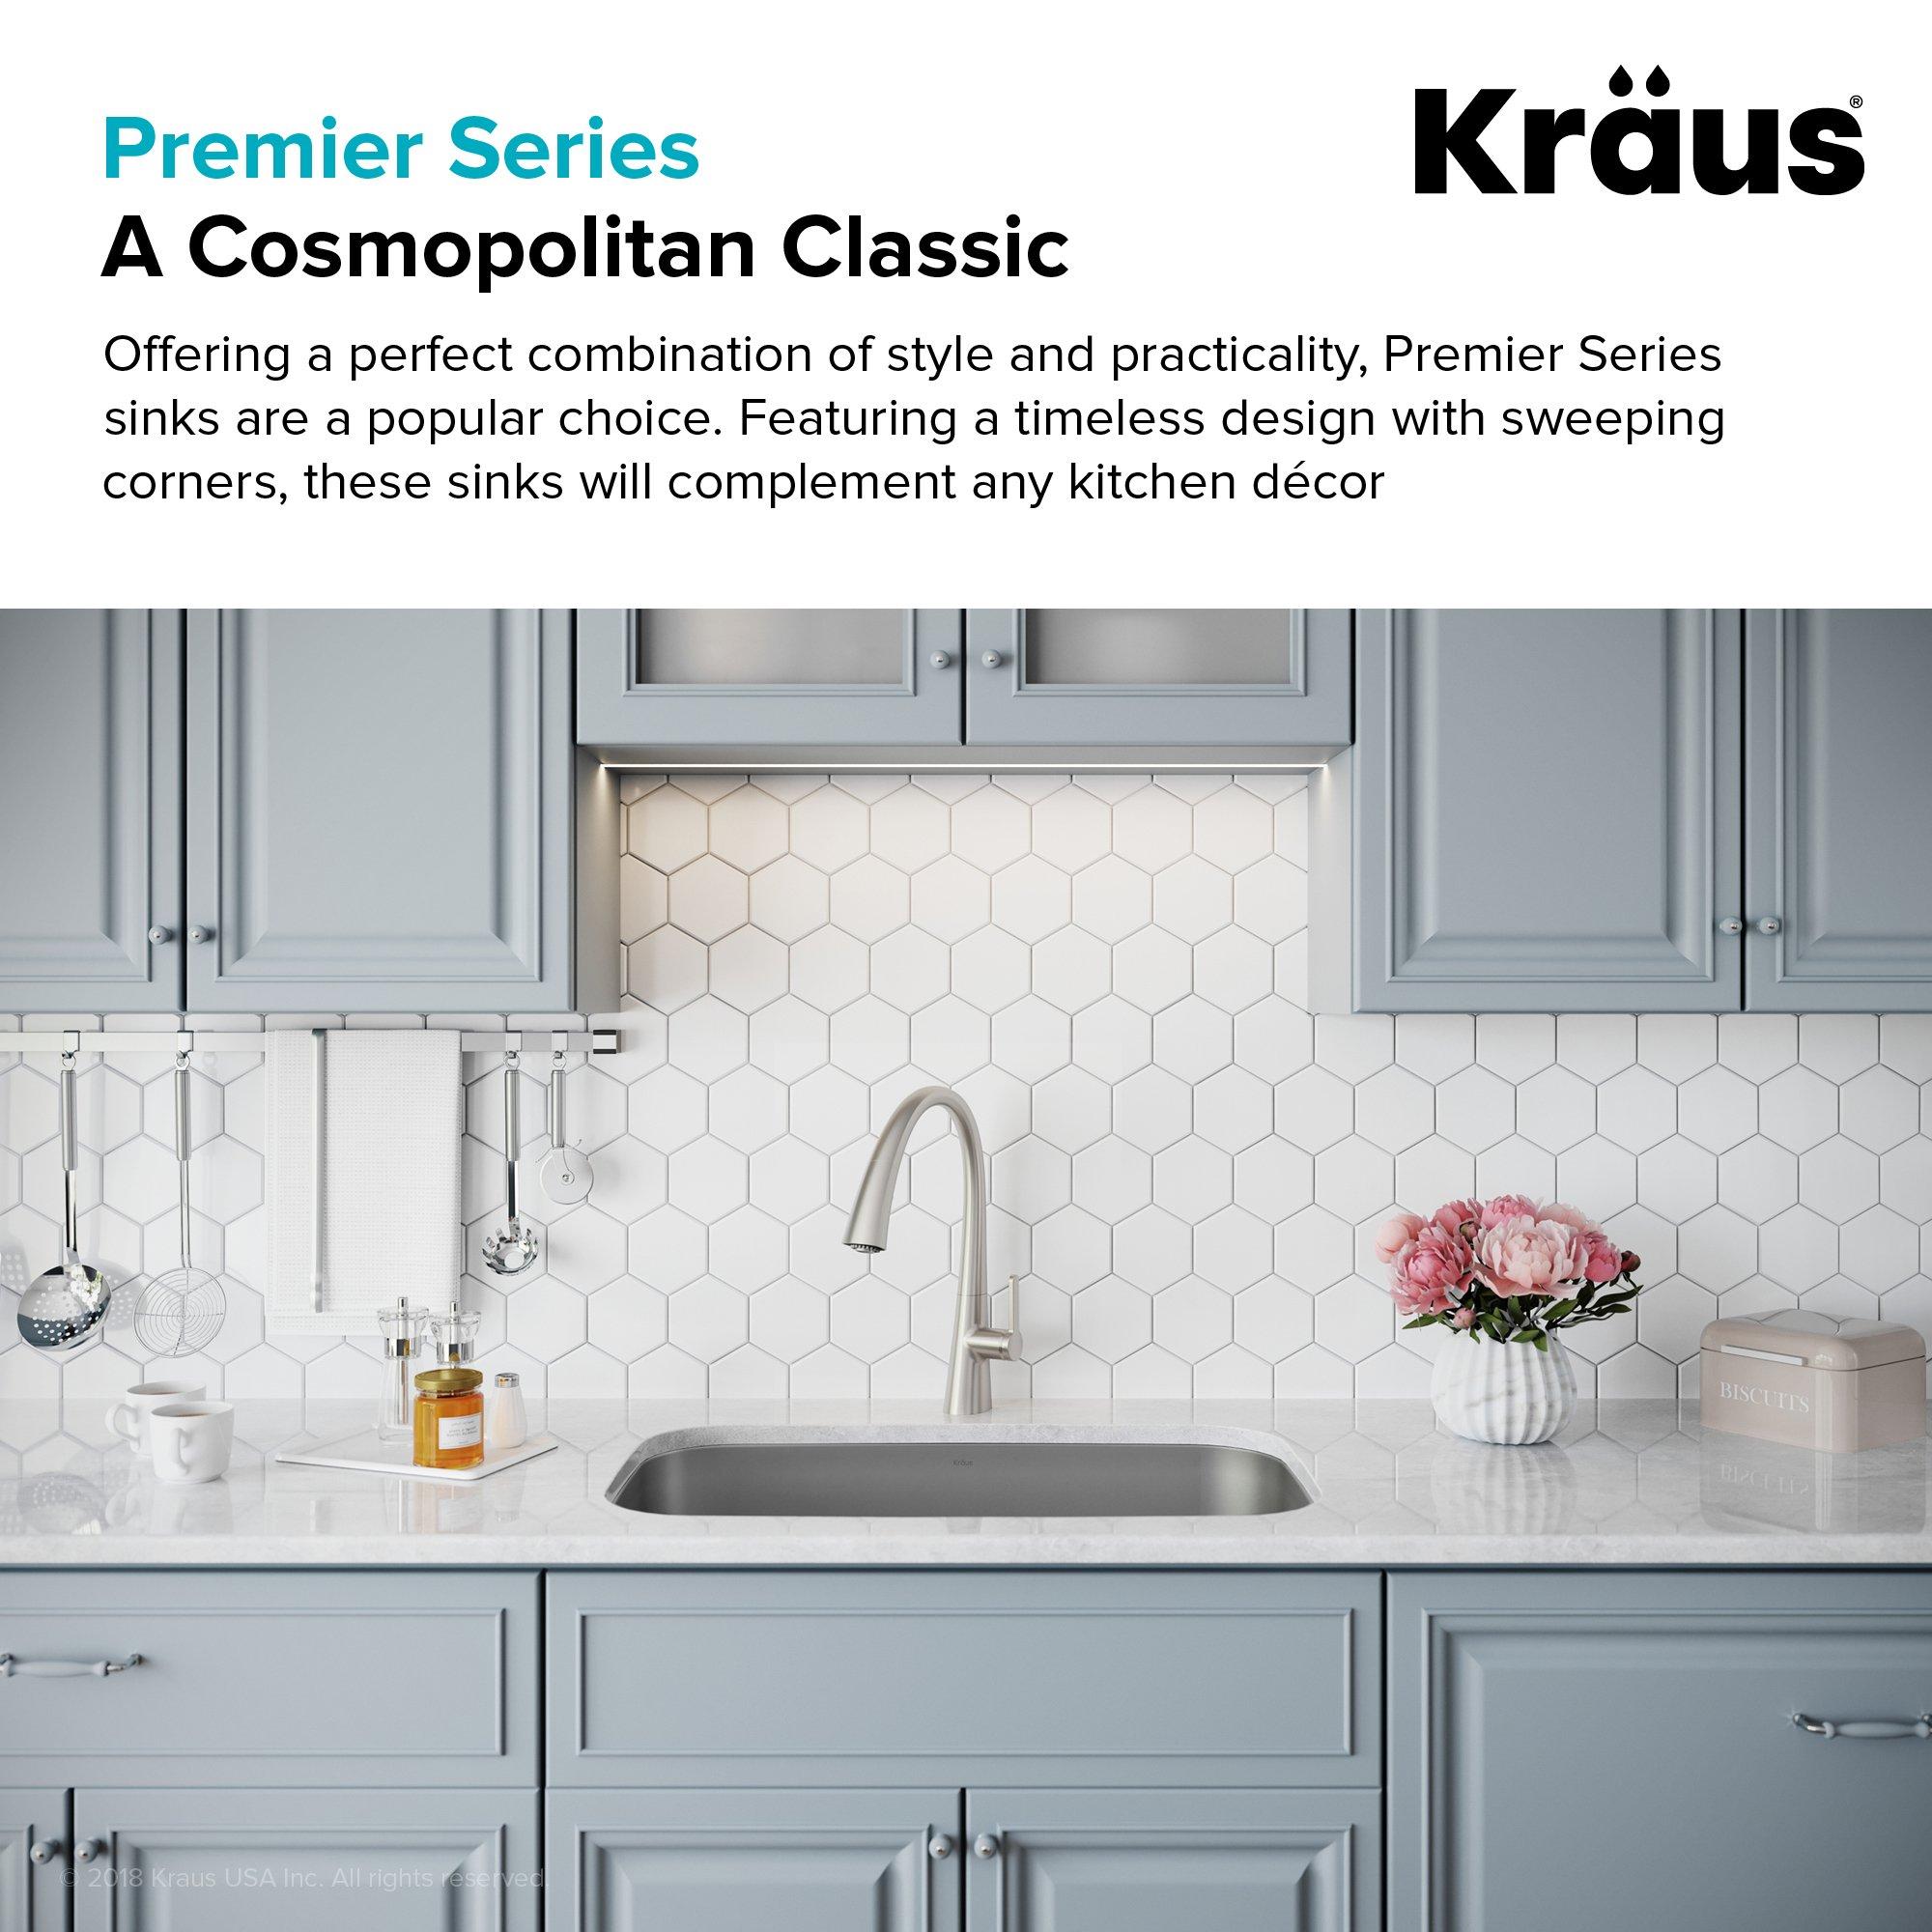 Kraus KBU14 31-1/2 inch Undermount Single Bowl 16-gauge Stainless Steel Kitchen Sink by Kraus (Image #4)